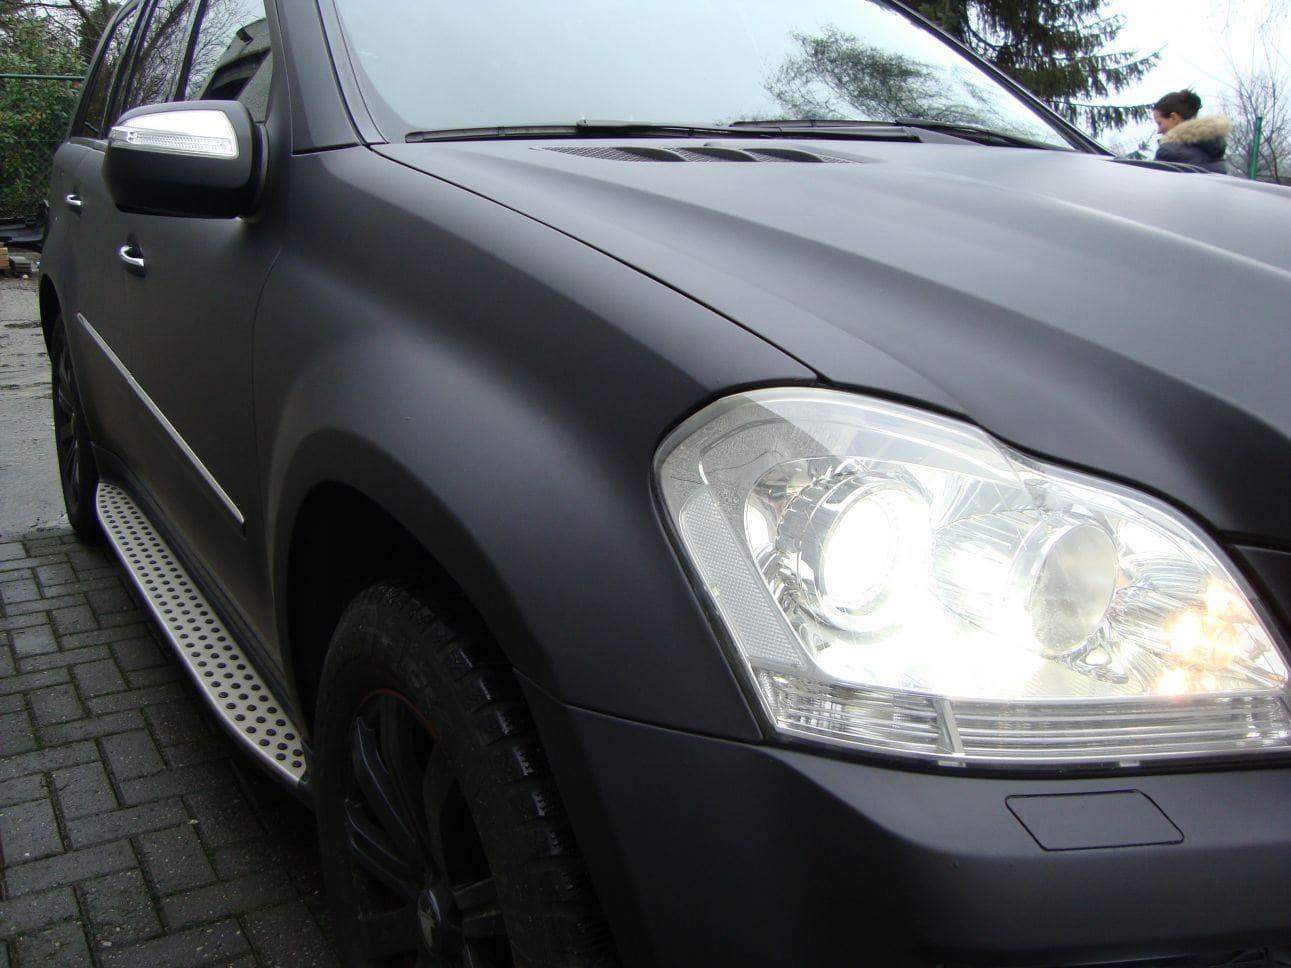 Mercedes GL met Mat Zwarte Wrap, Carwrapping door Wrapmyride.nu Foto-nr:6285, ©2021